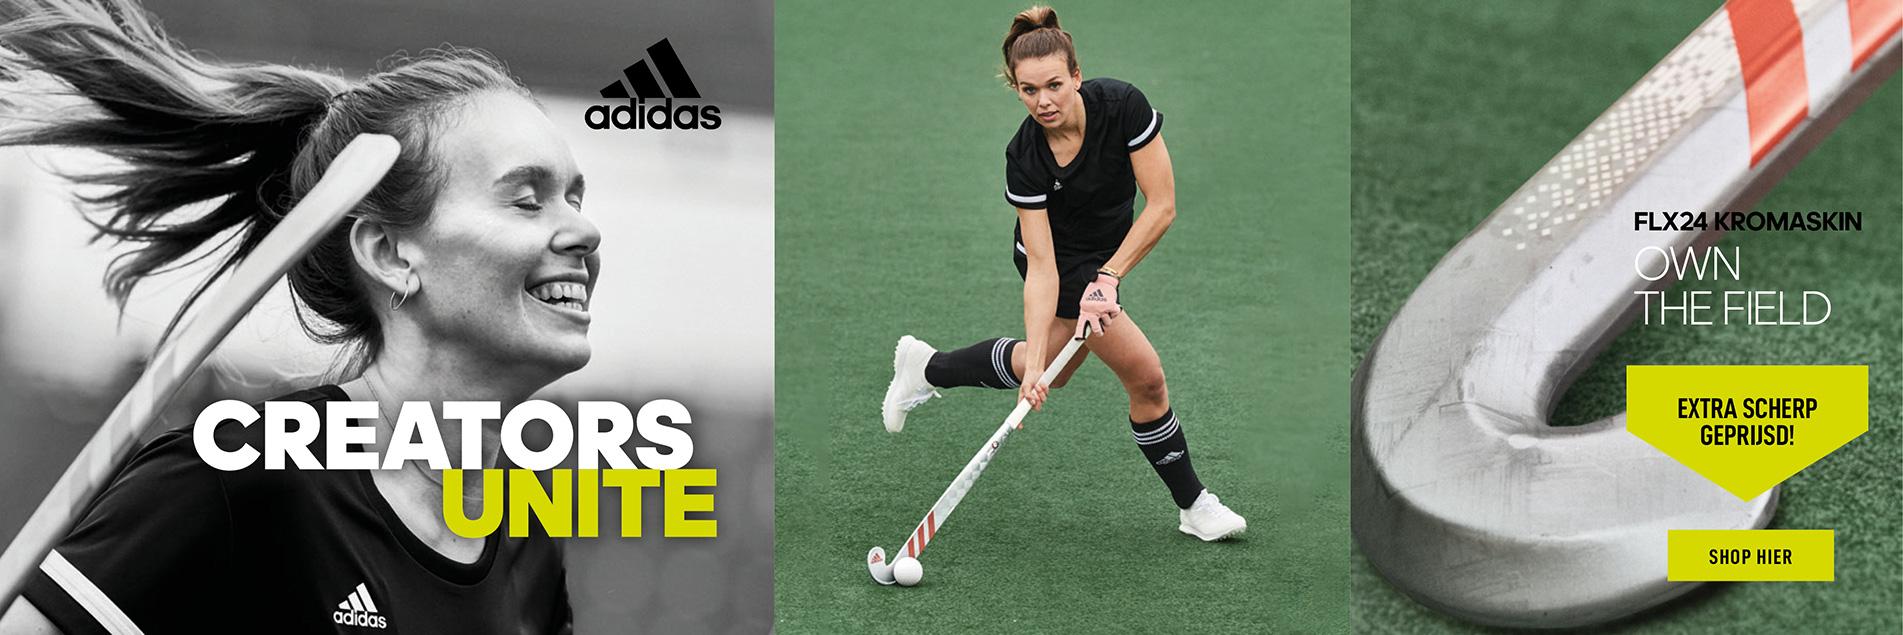 adidas hockeysticks